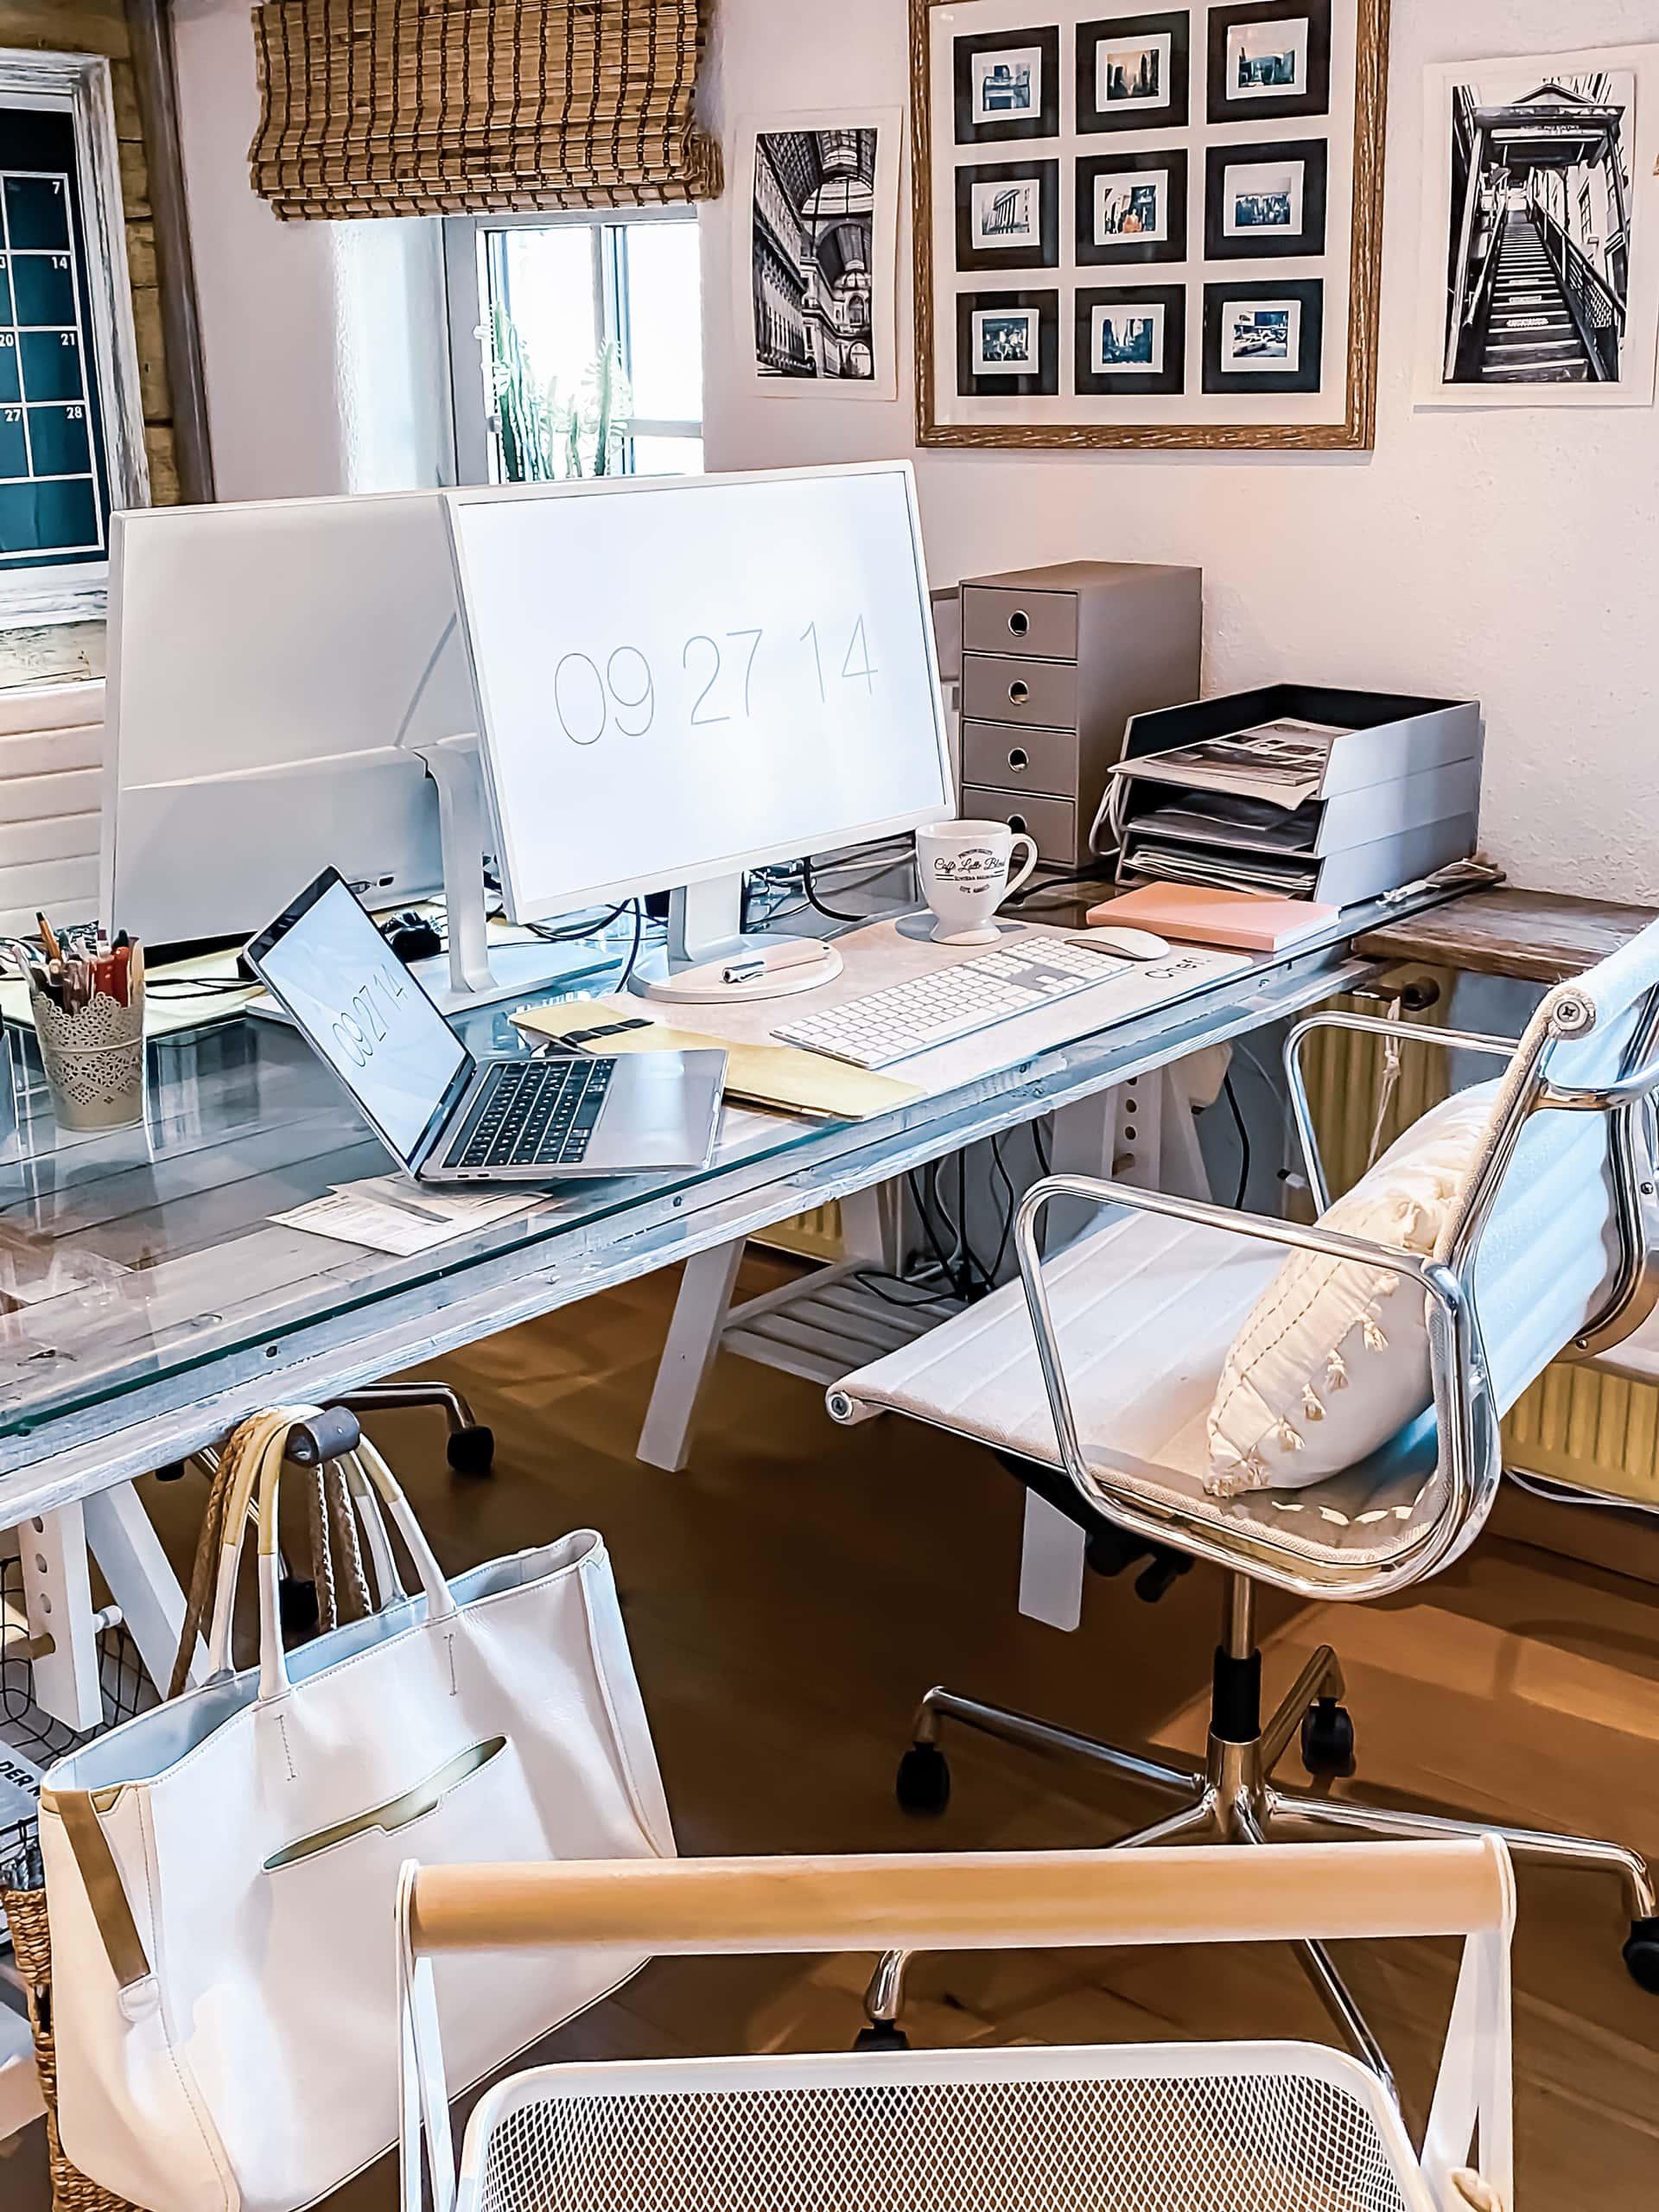 Home office, DIY, Büro, Bildschirm, Monitor, pimp, weise Büromöbel, modernes Home Office